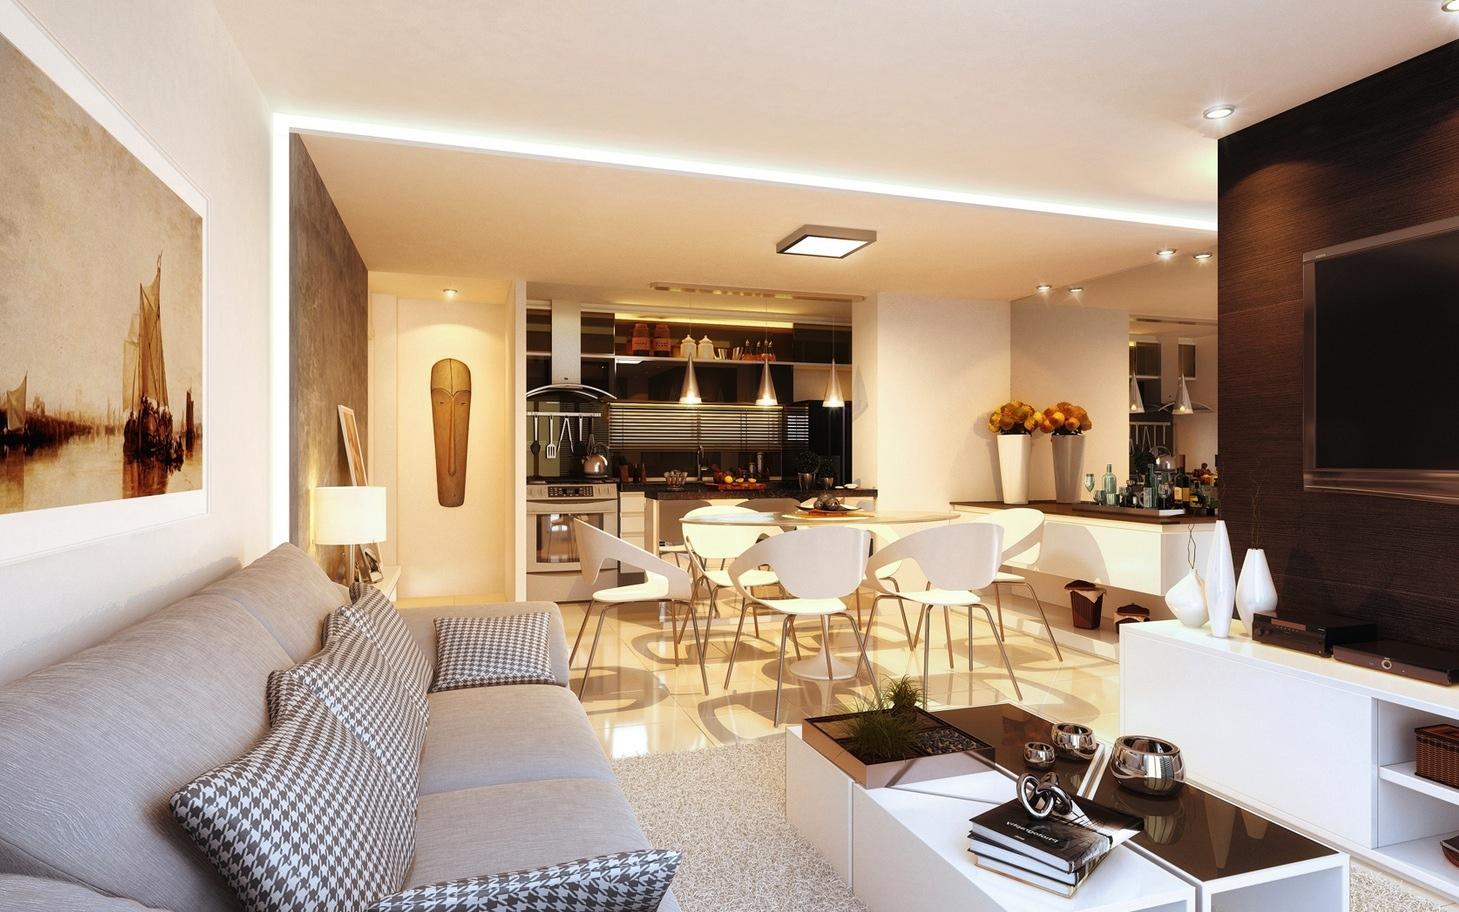 Интерьер дизайнерской квартиры-студии от Ax Studio